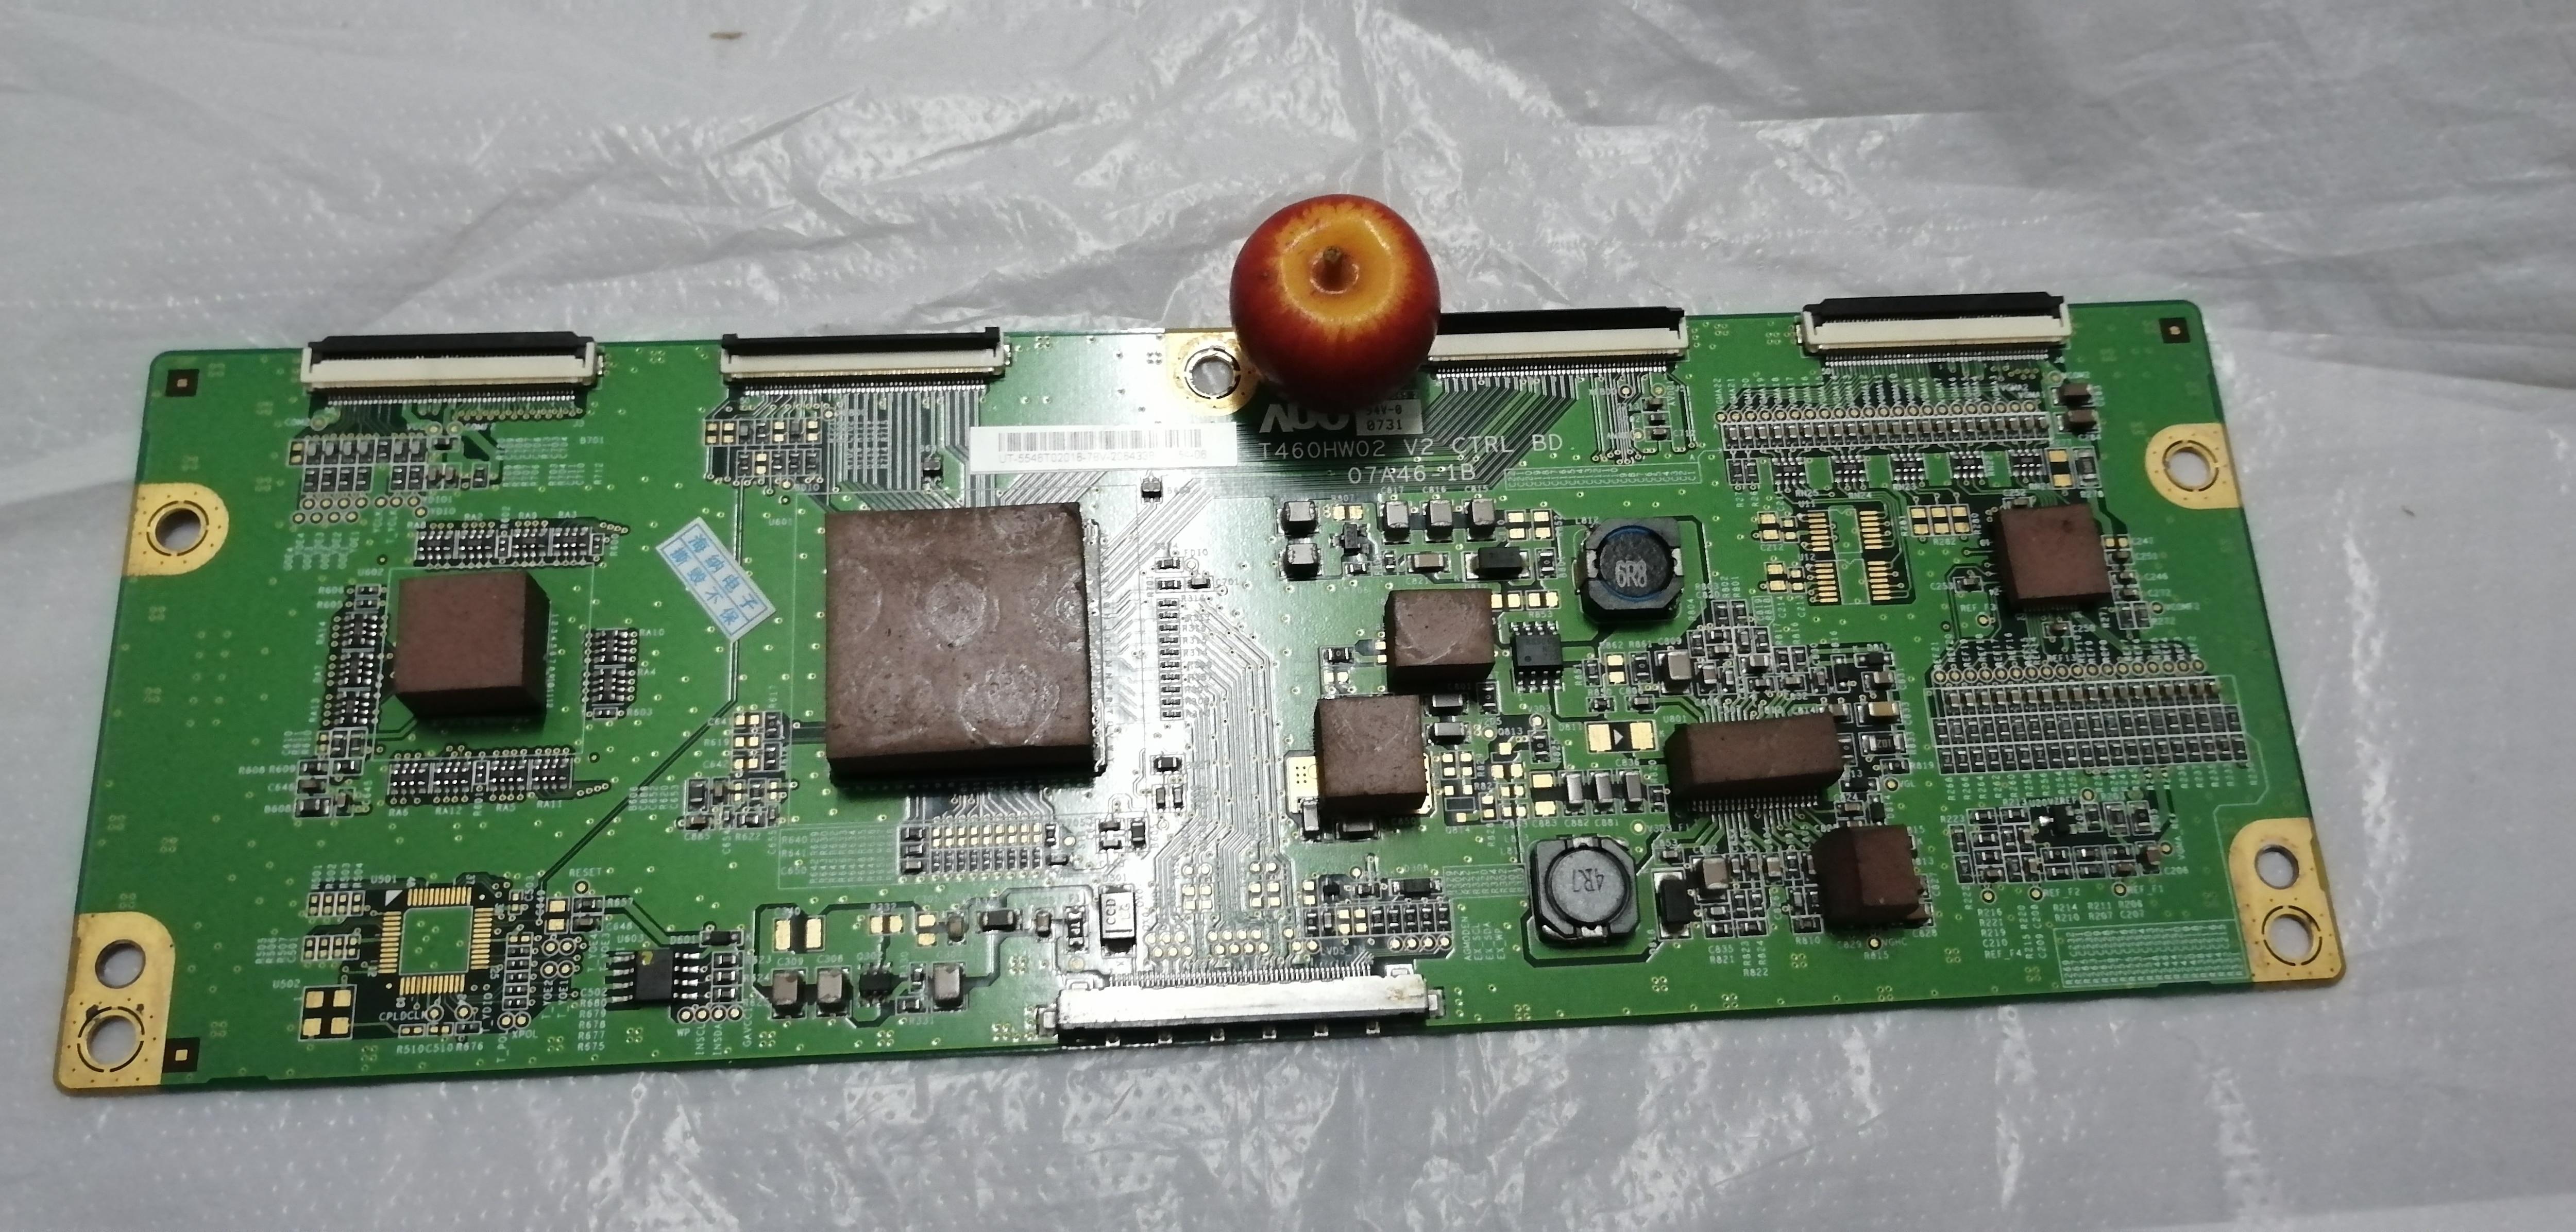 Placa LCD T460HW02 V2 07A46-1B placa lógica conectar con placa de conexión T-CON